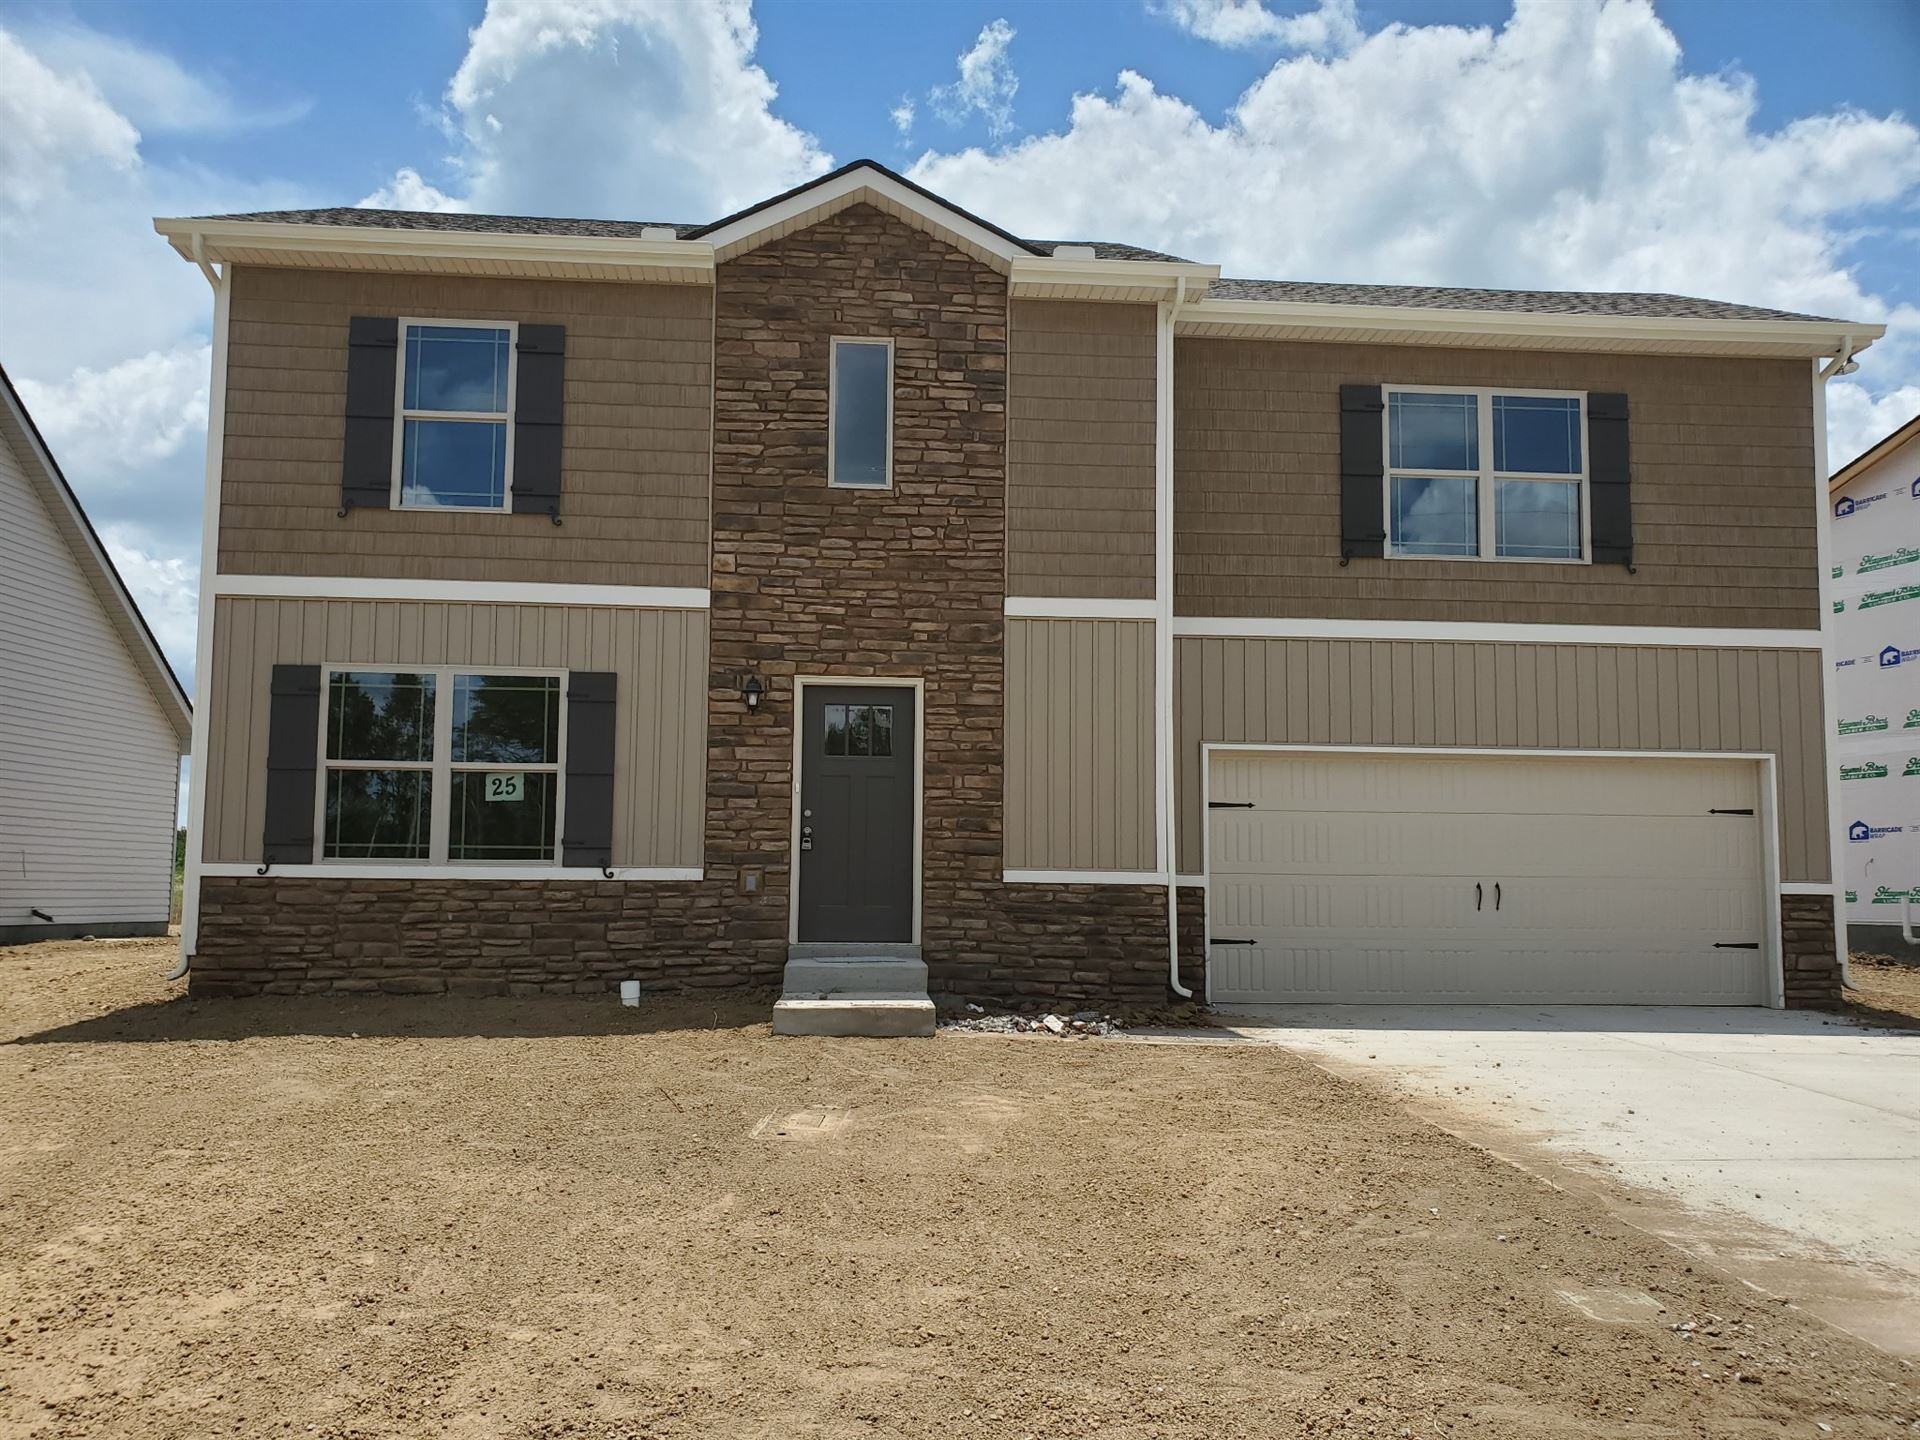 2239 Red Barn Road, Christiana, TN 37037 - MLS#: 2263889